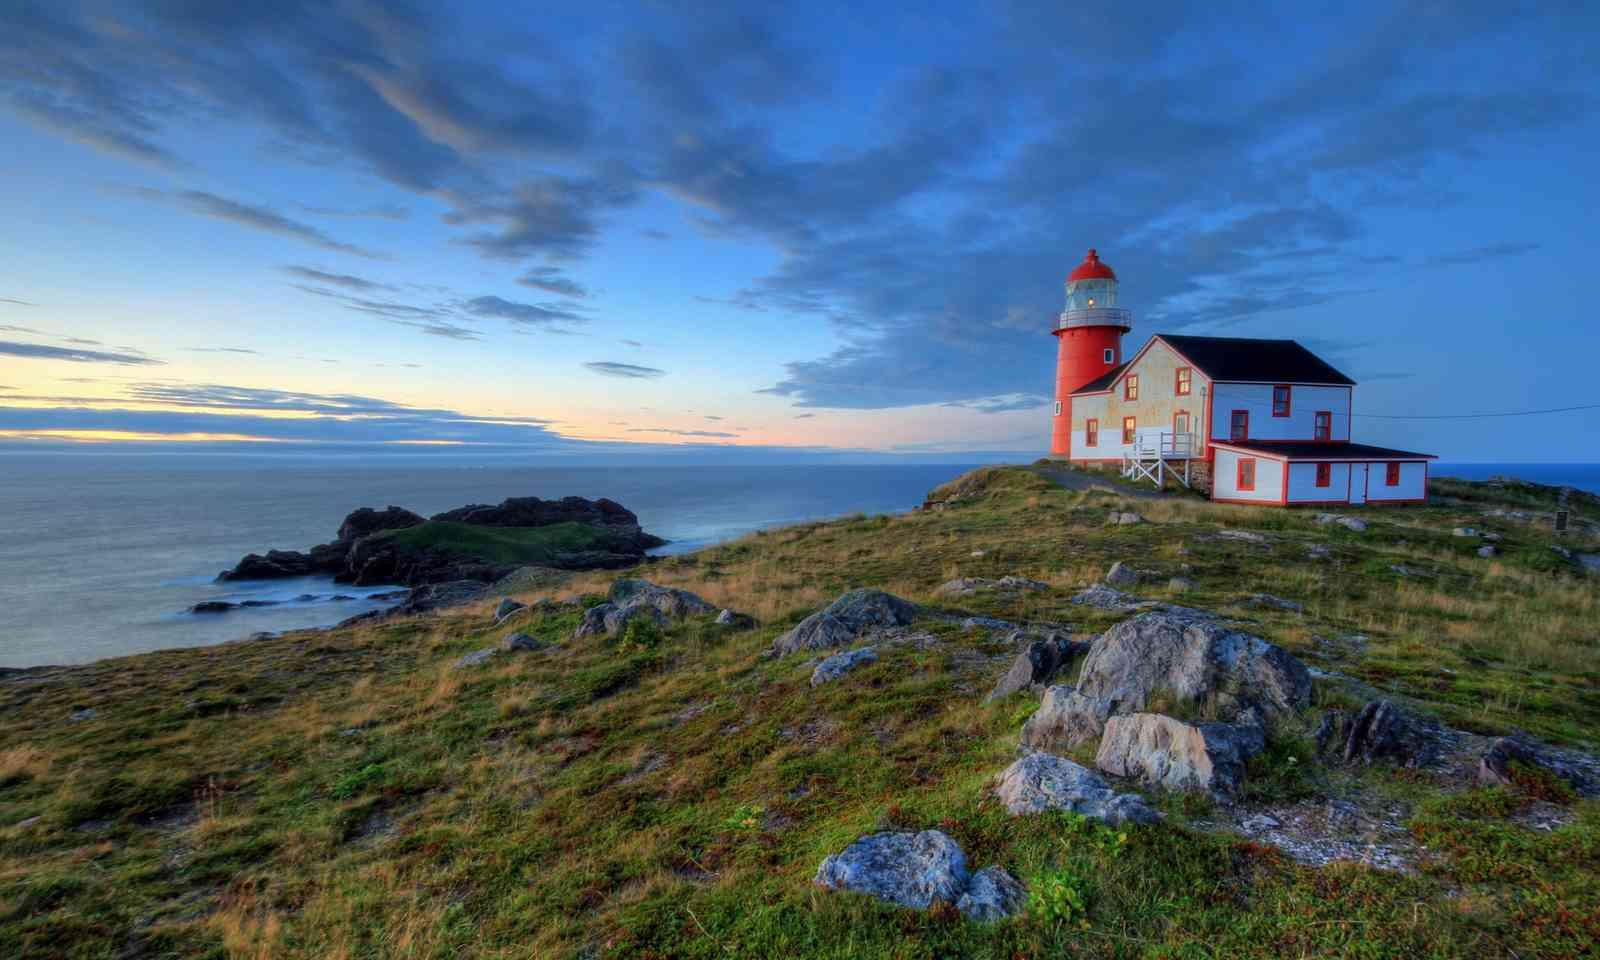 Lighthouse in Newfoundland (Shutterstock.com)